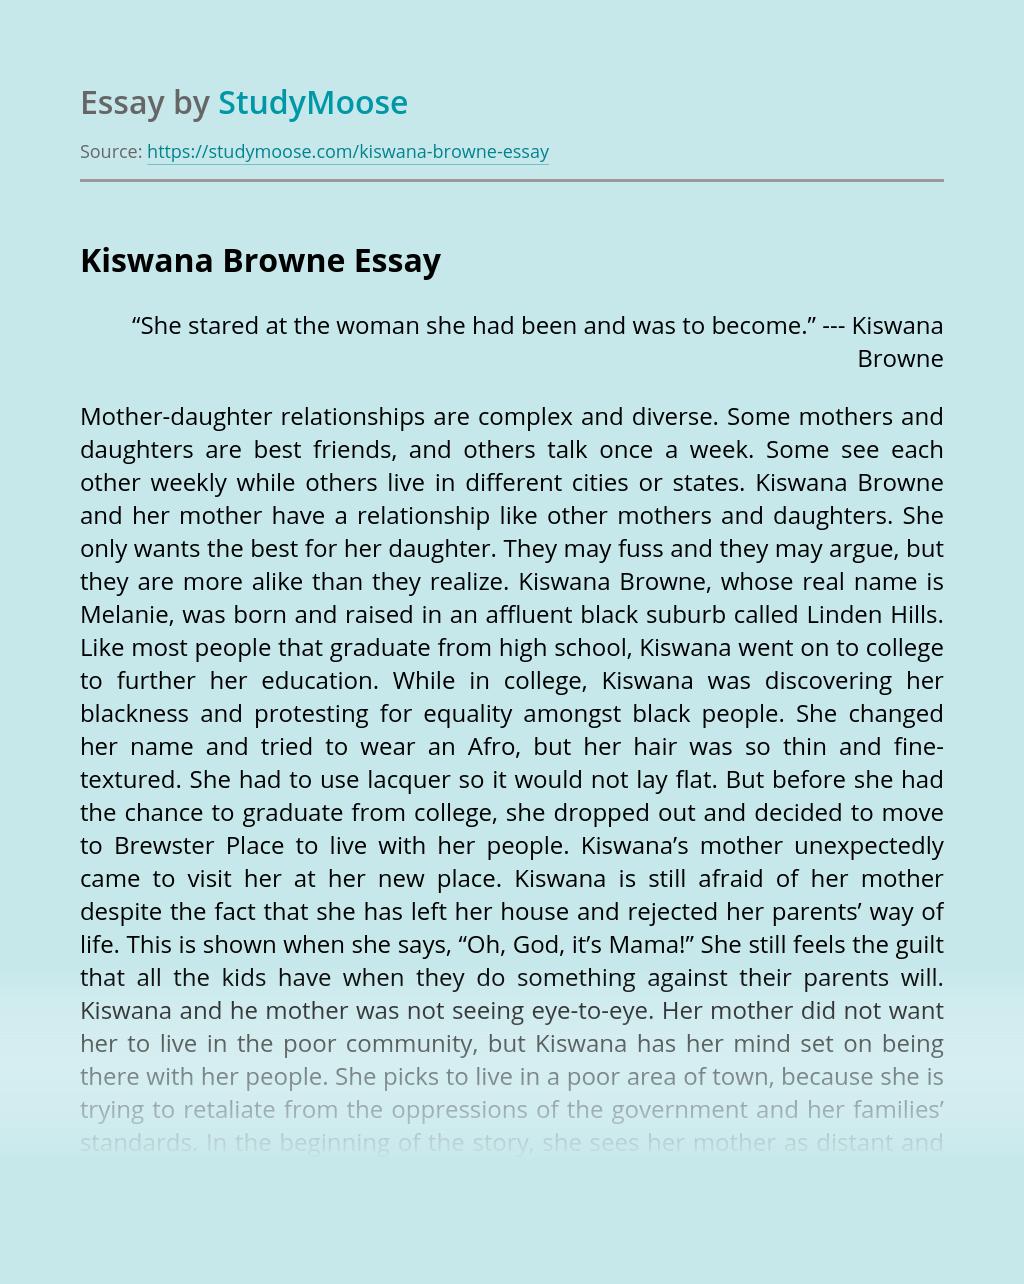 Kiswana Browne